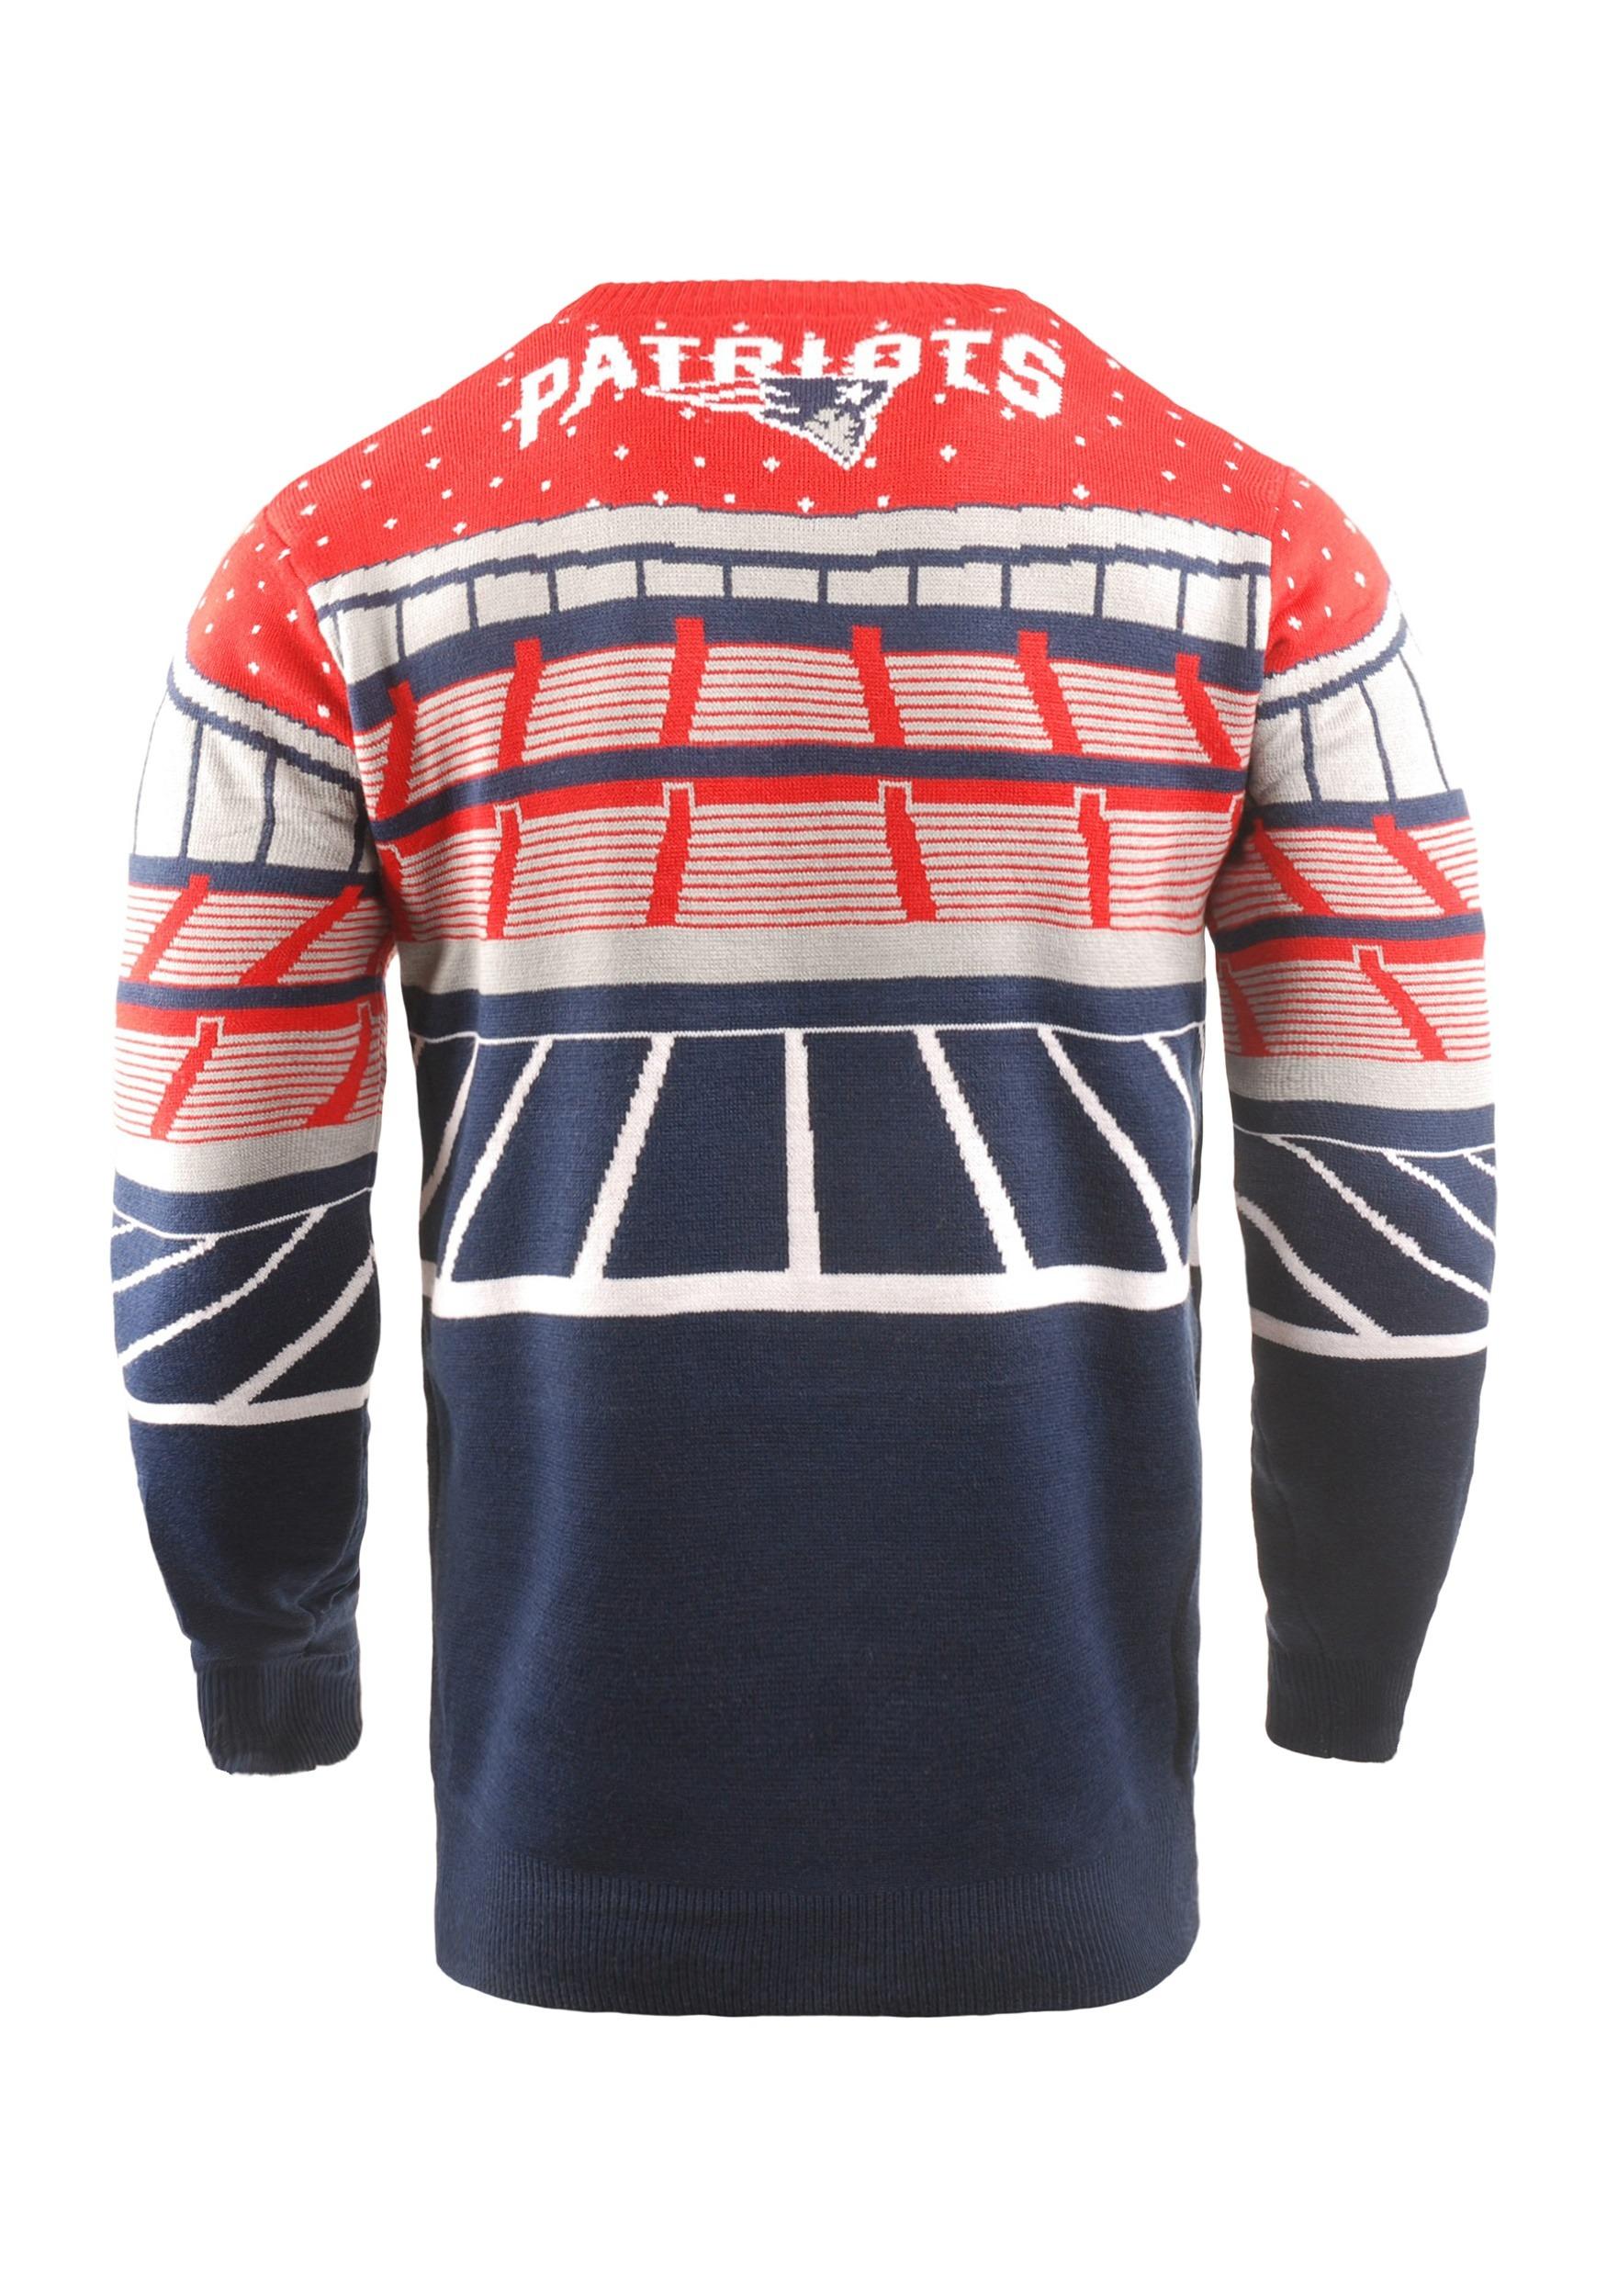 patriots christmas jersey